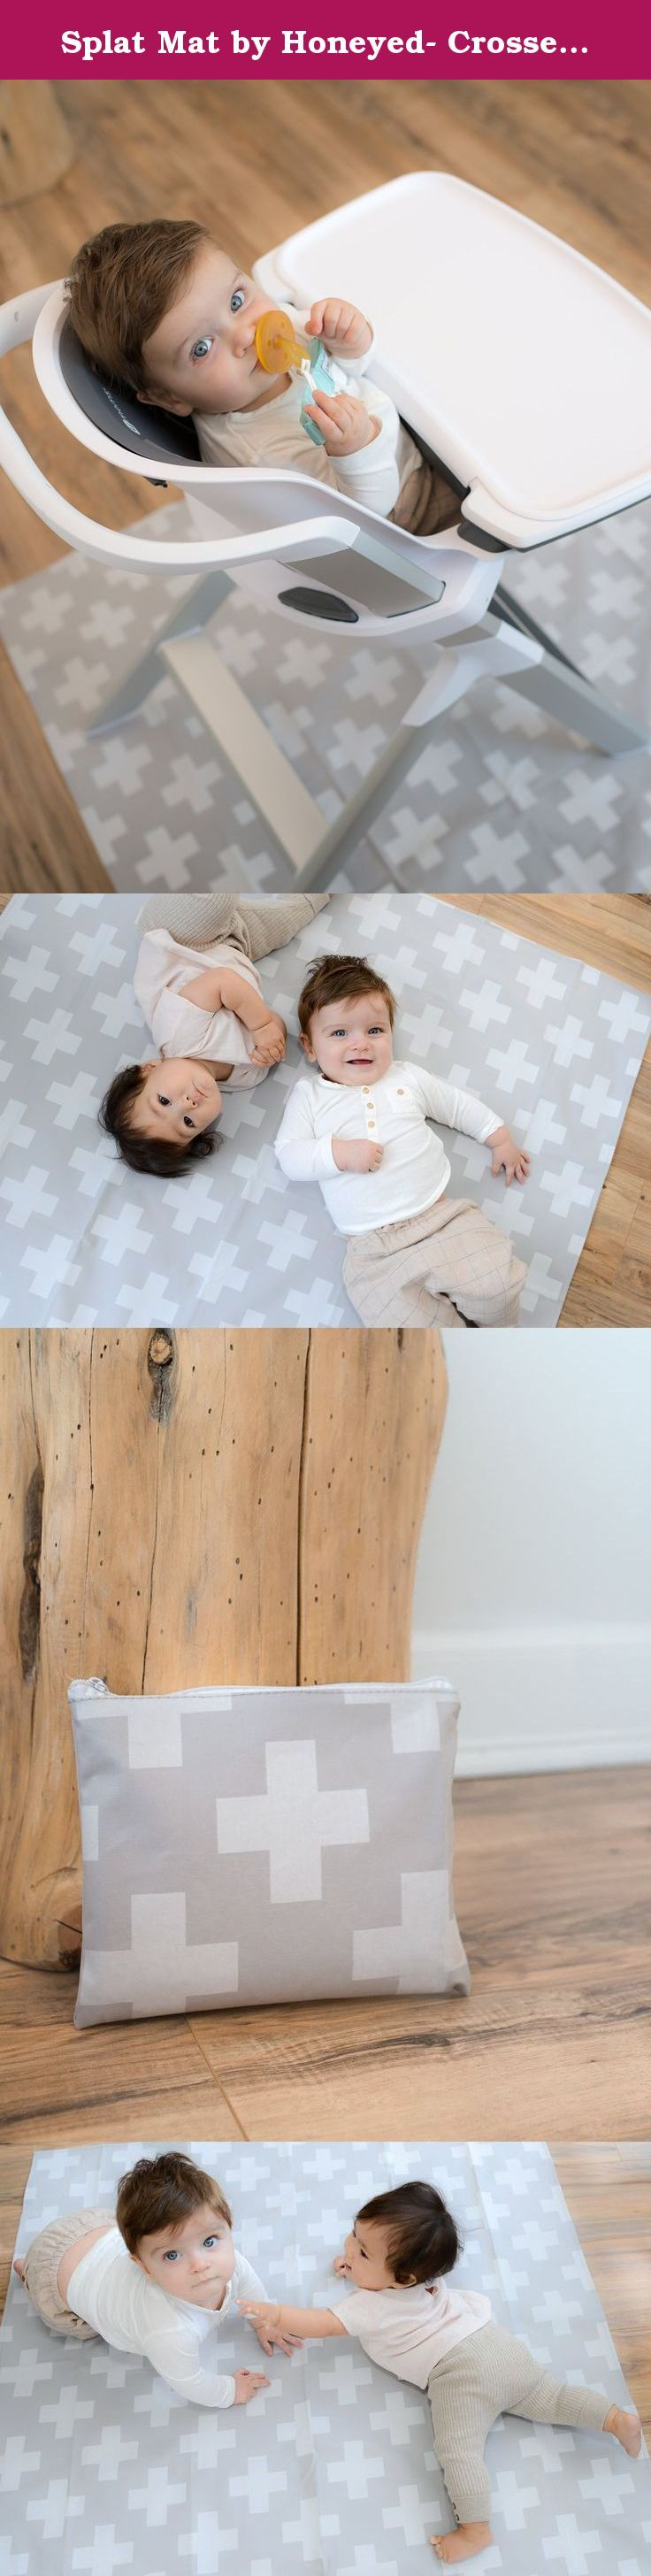 splat mat by honeyed crosses modern design large non toxic high